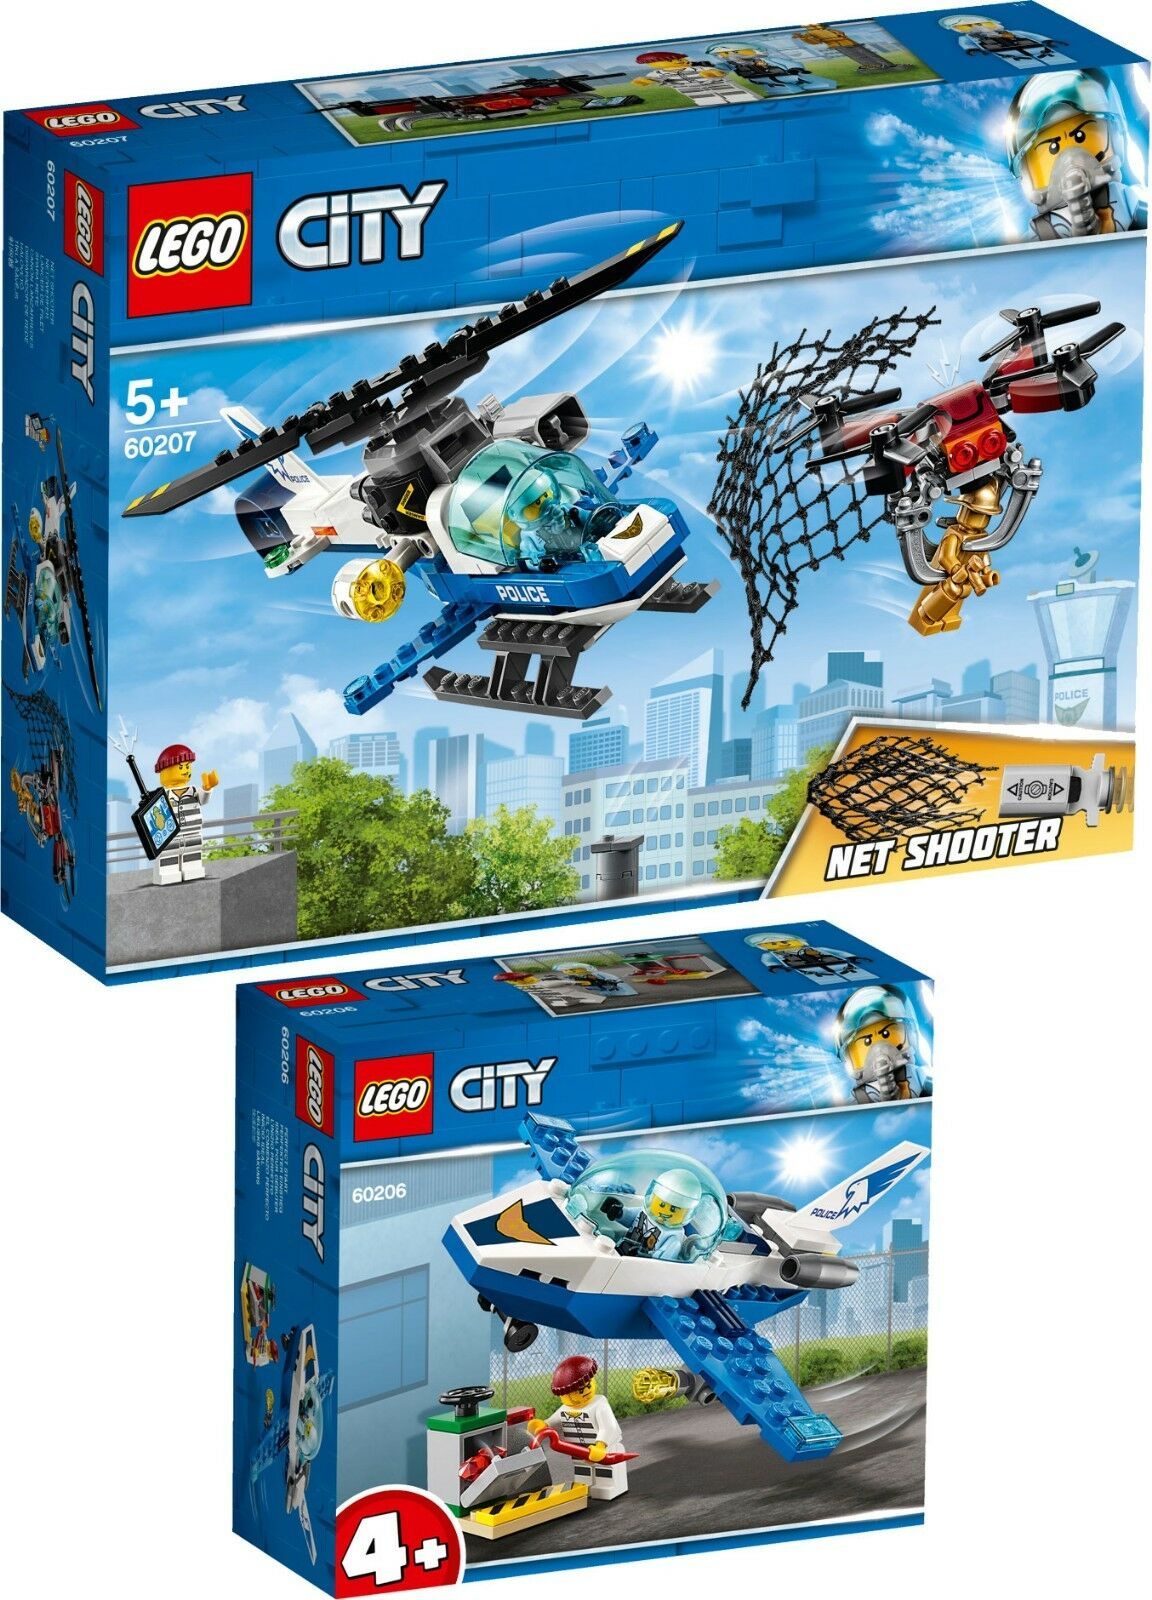 LEGO CITY POLICE drohnenjagd 60207 60207 60207 60206 avion patrouille n1 19 5df1cd